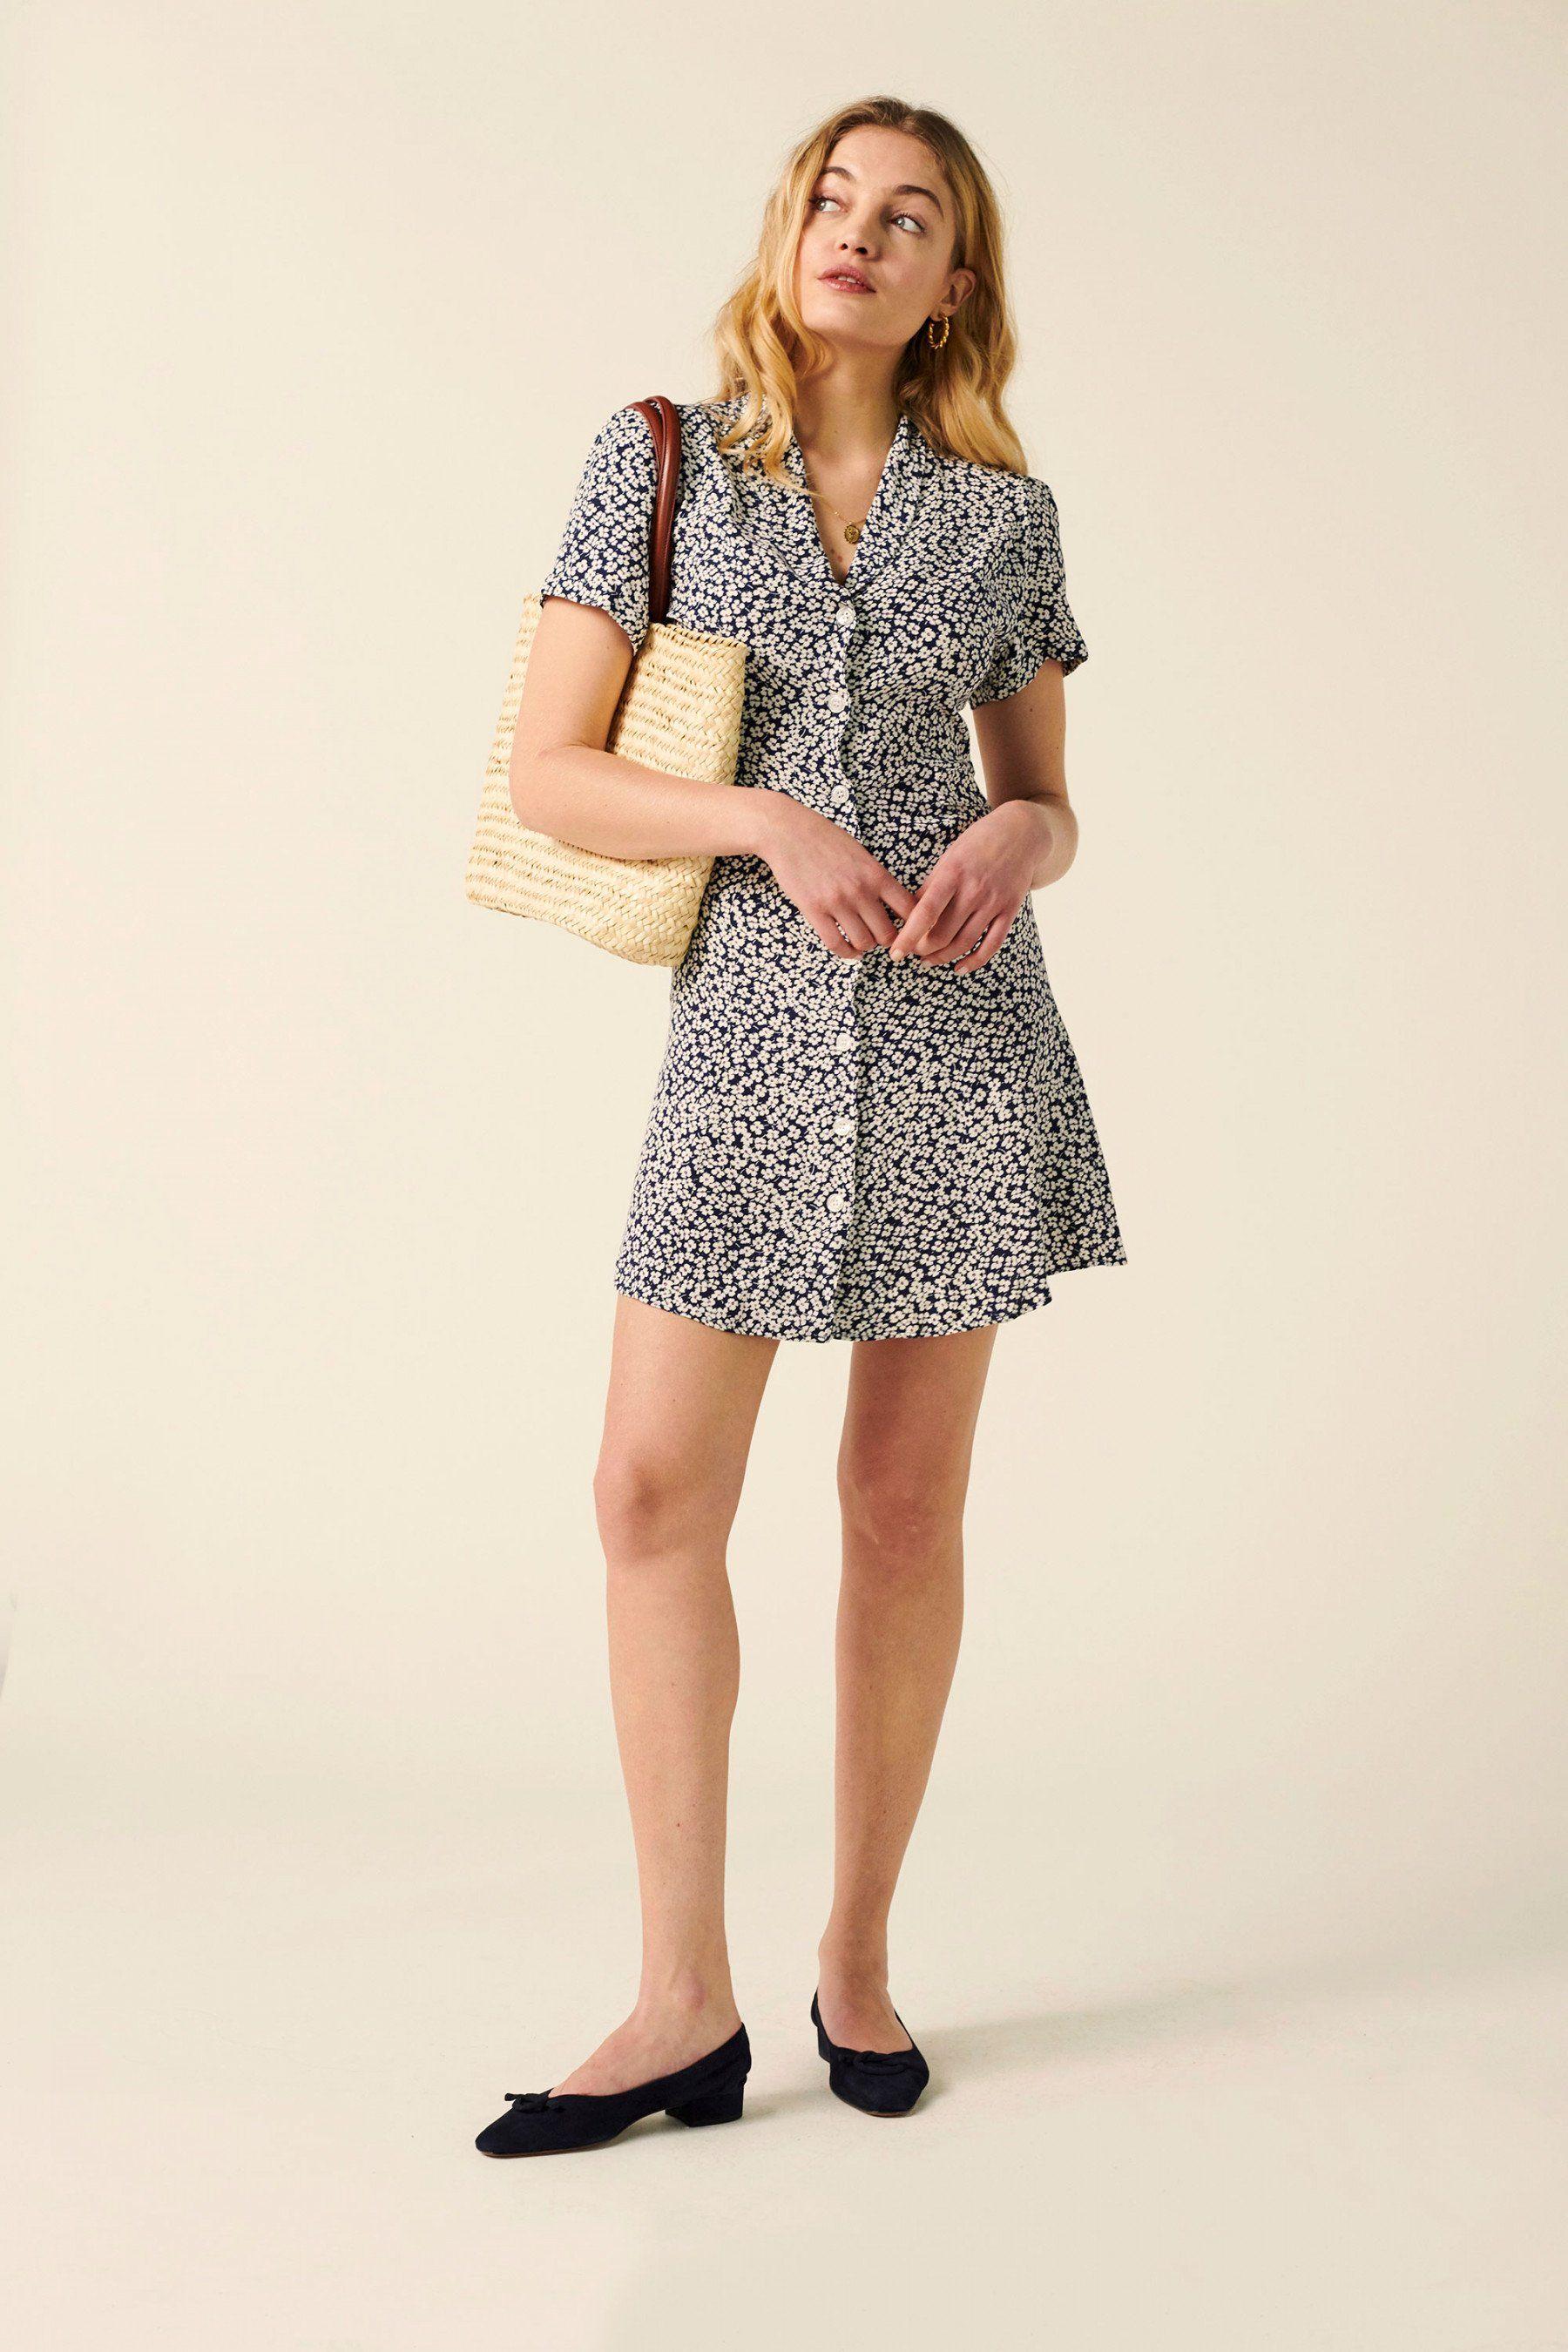 Rouje Marion Dress Dresses Fashion Nice Dresses [ 2700 x 1800 Pixel ]